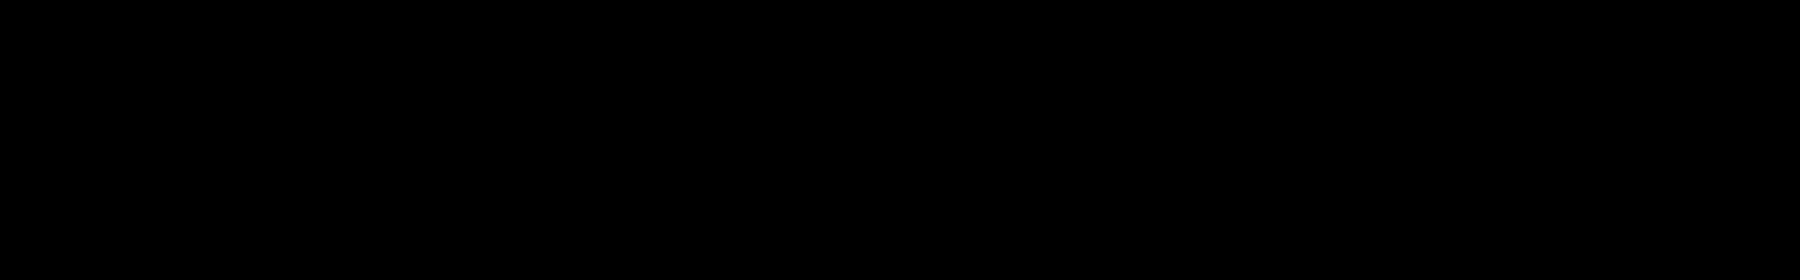 Ableton Shock Template audio waveform